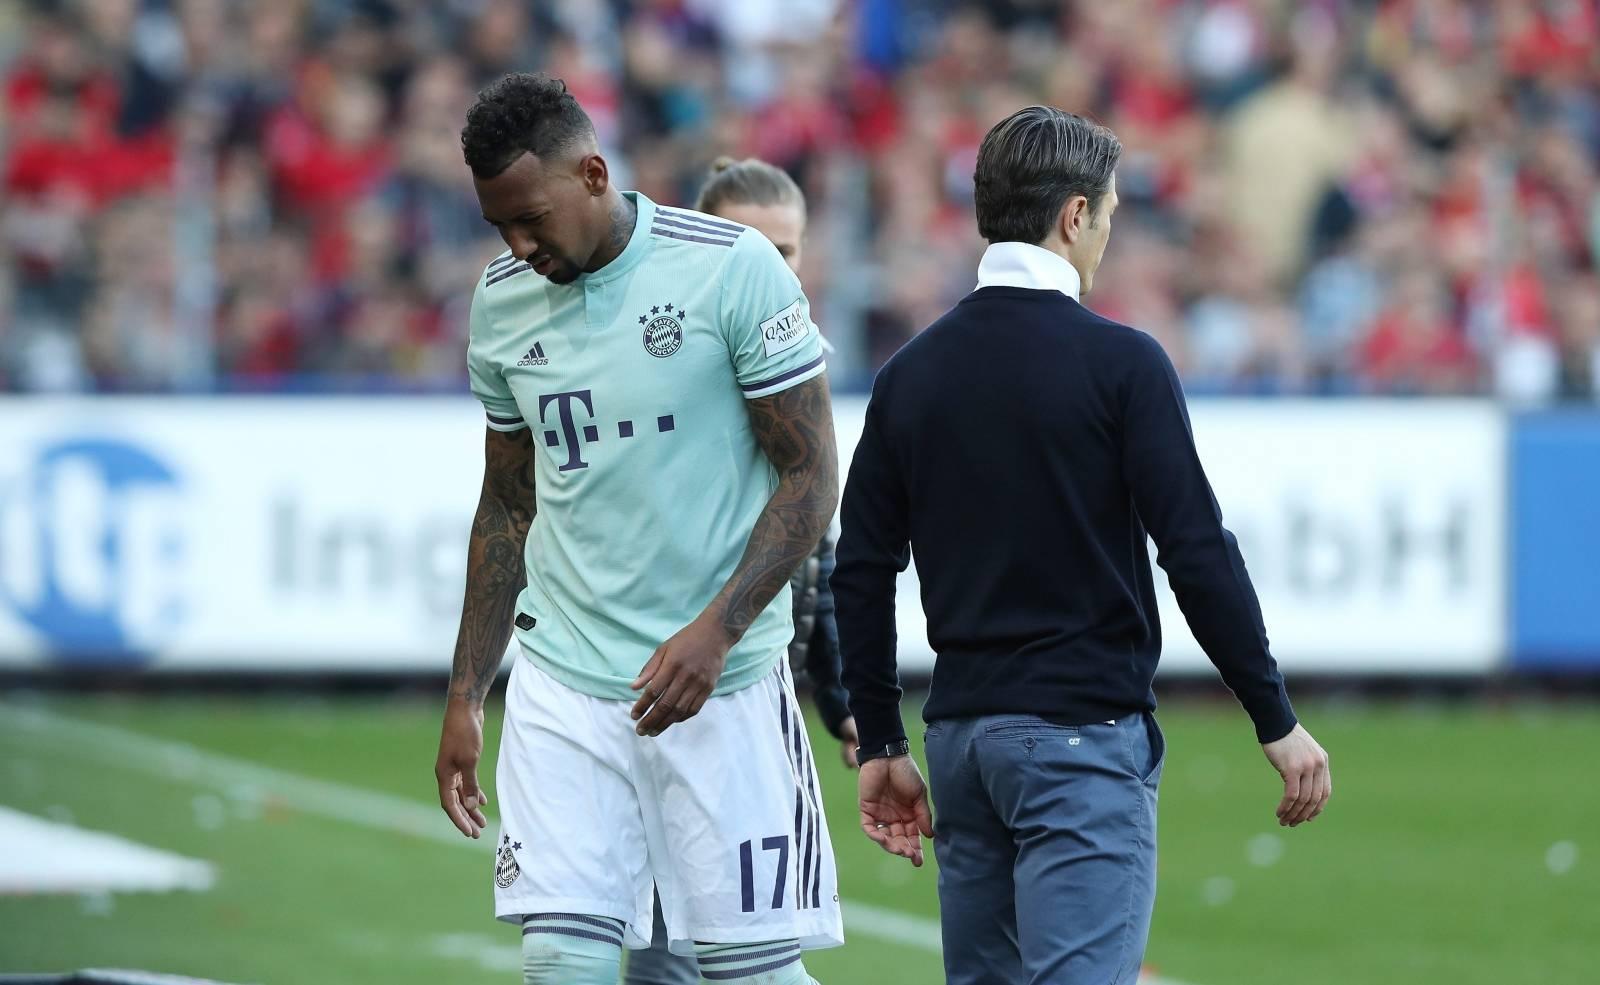 firo: 30.03.2019 Football, Football: 1. Bundesliga SC Freiburg - FC Bayern Munich Muenchen